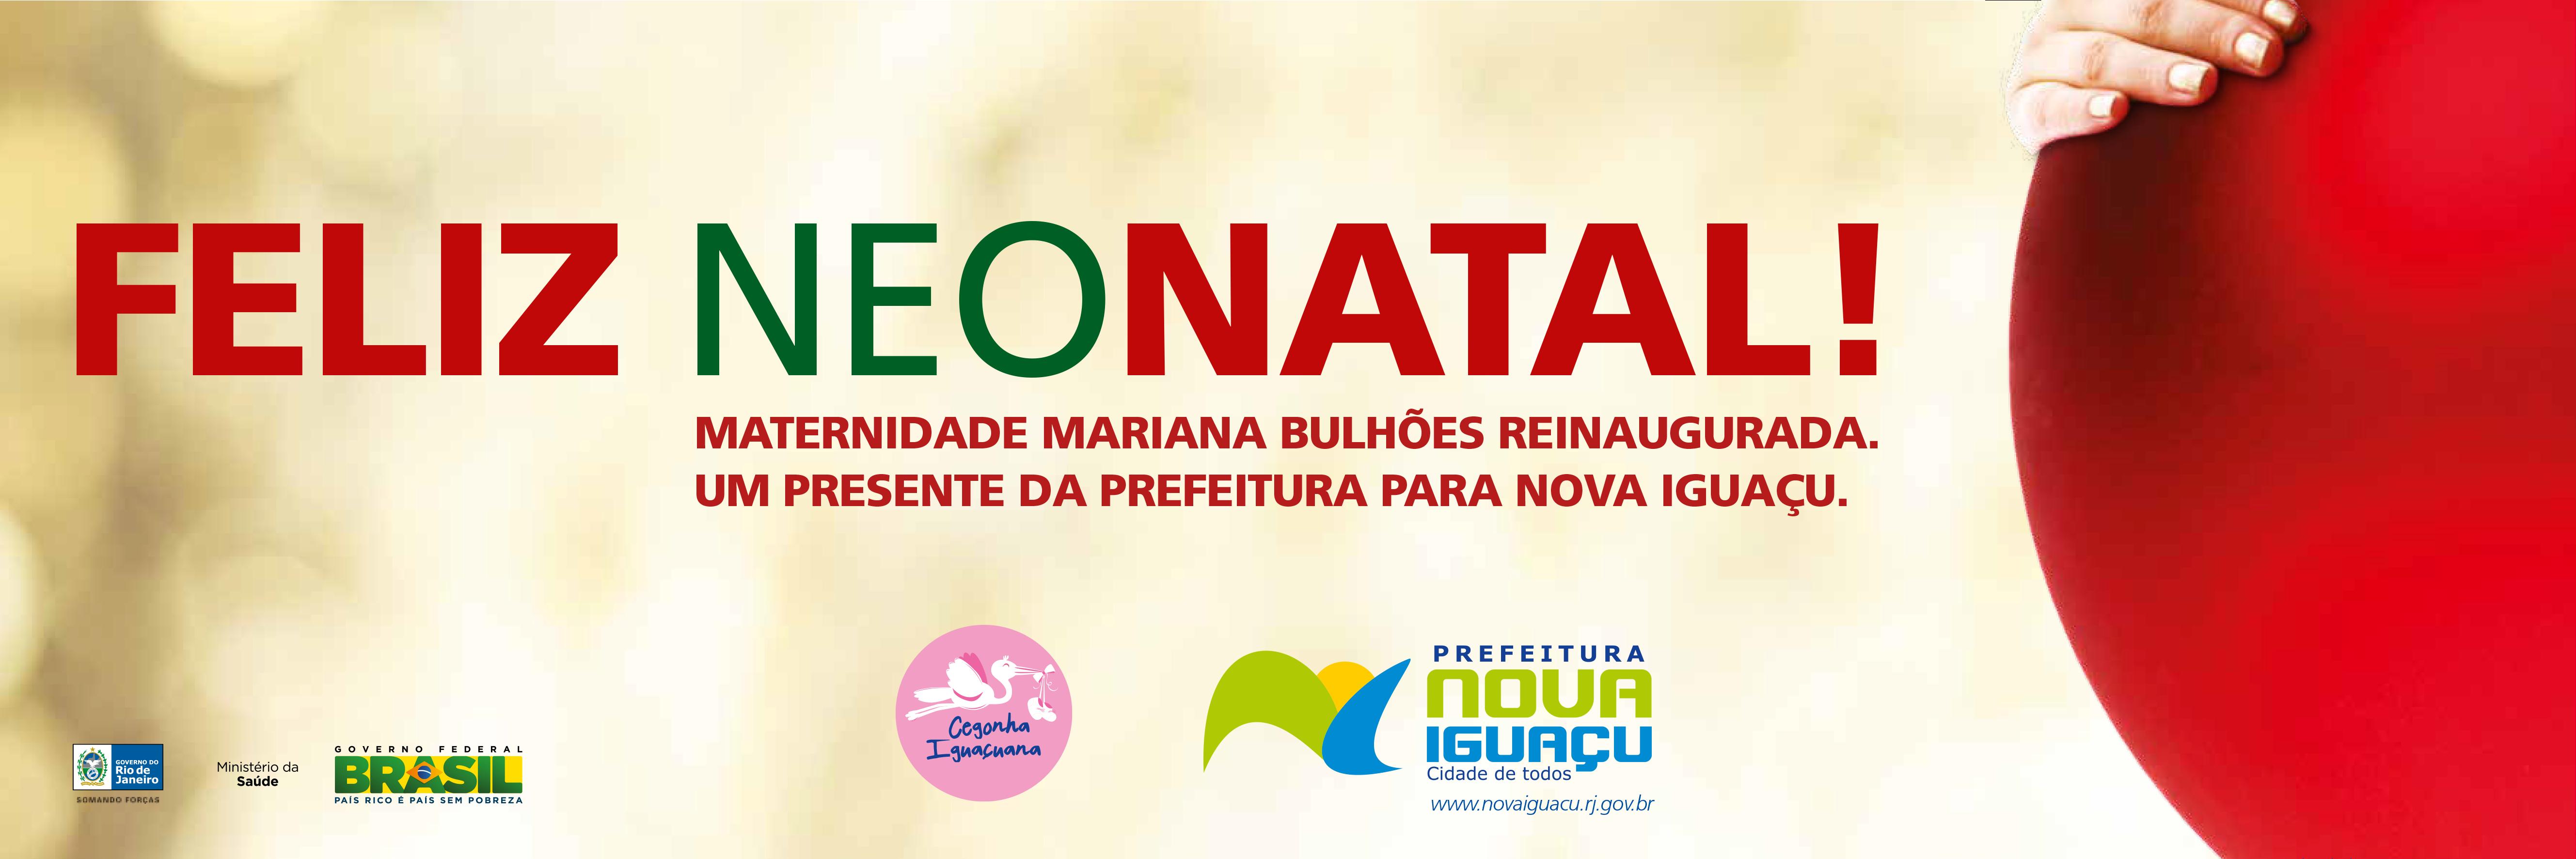 Prefeitura de Nova Iguaçu - NeoNatal